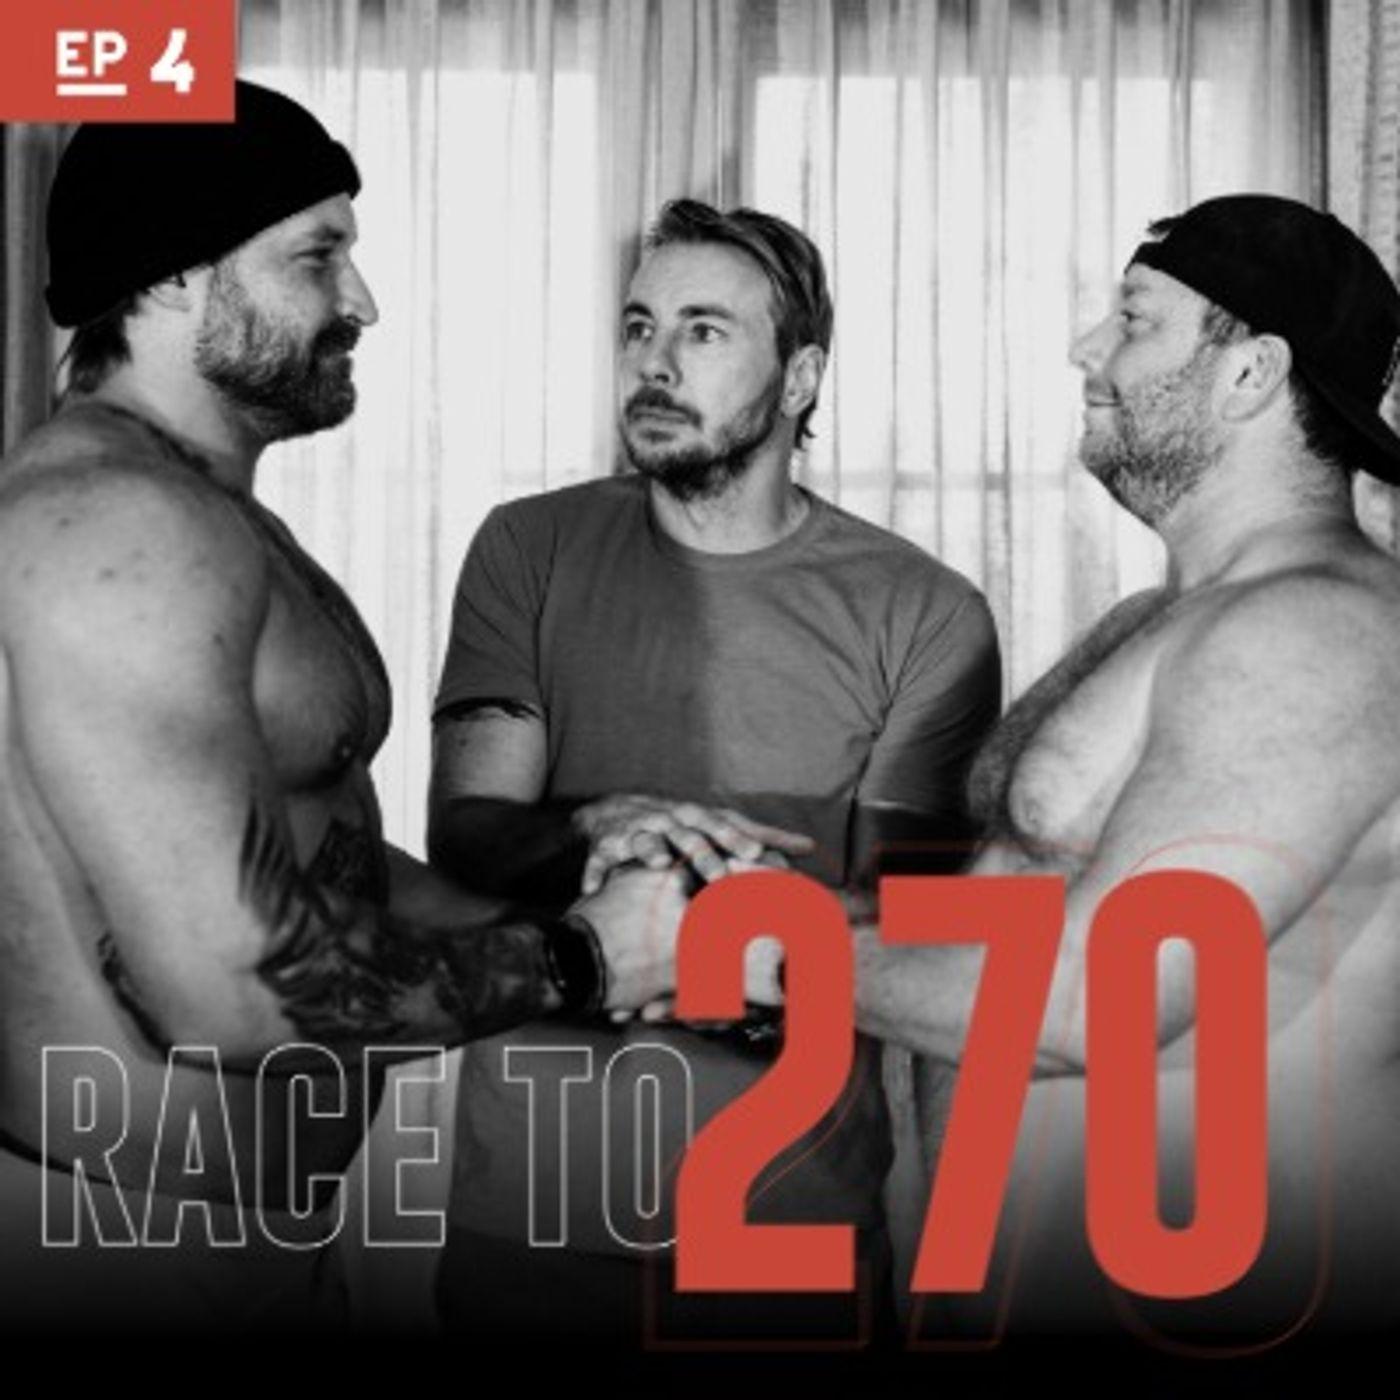 Race to 270: Body Bronzer & Big Dan with his Big Chrome Ferrari